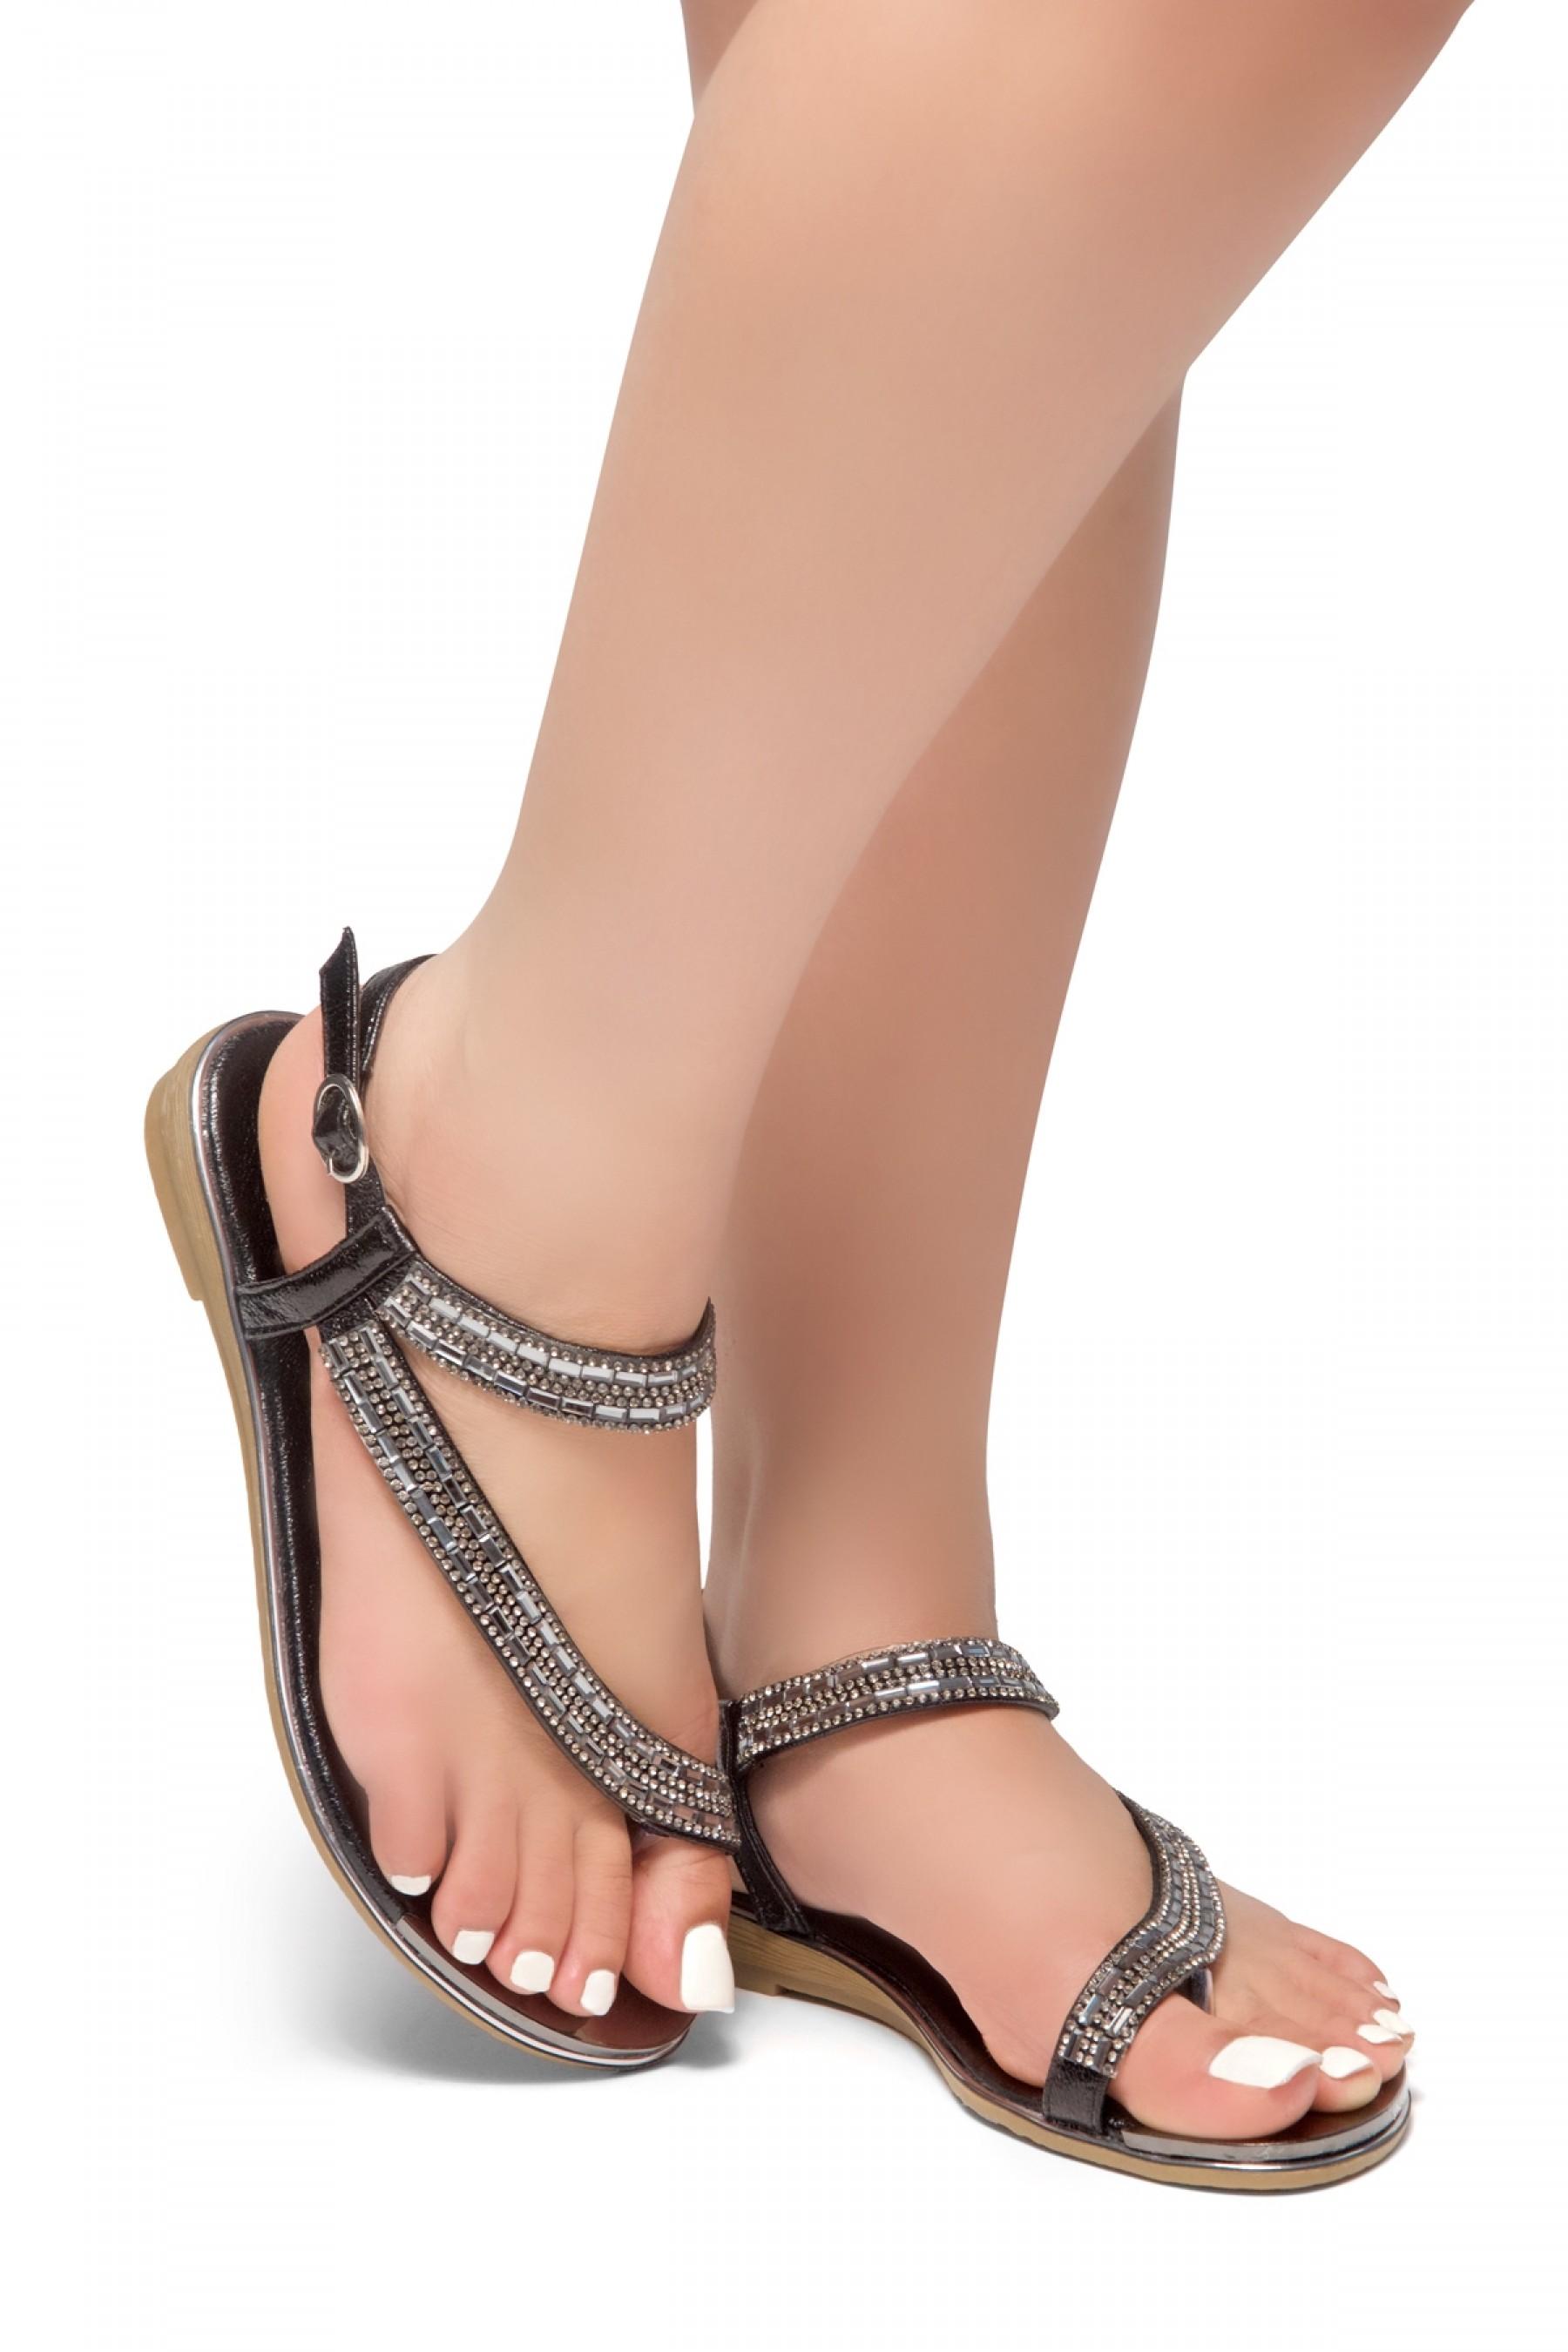 HerStyle Talluto-Rhinestone Details, Open Toe, Flat Sandals (Black)